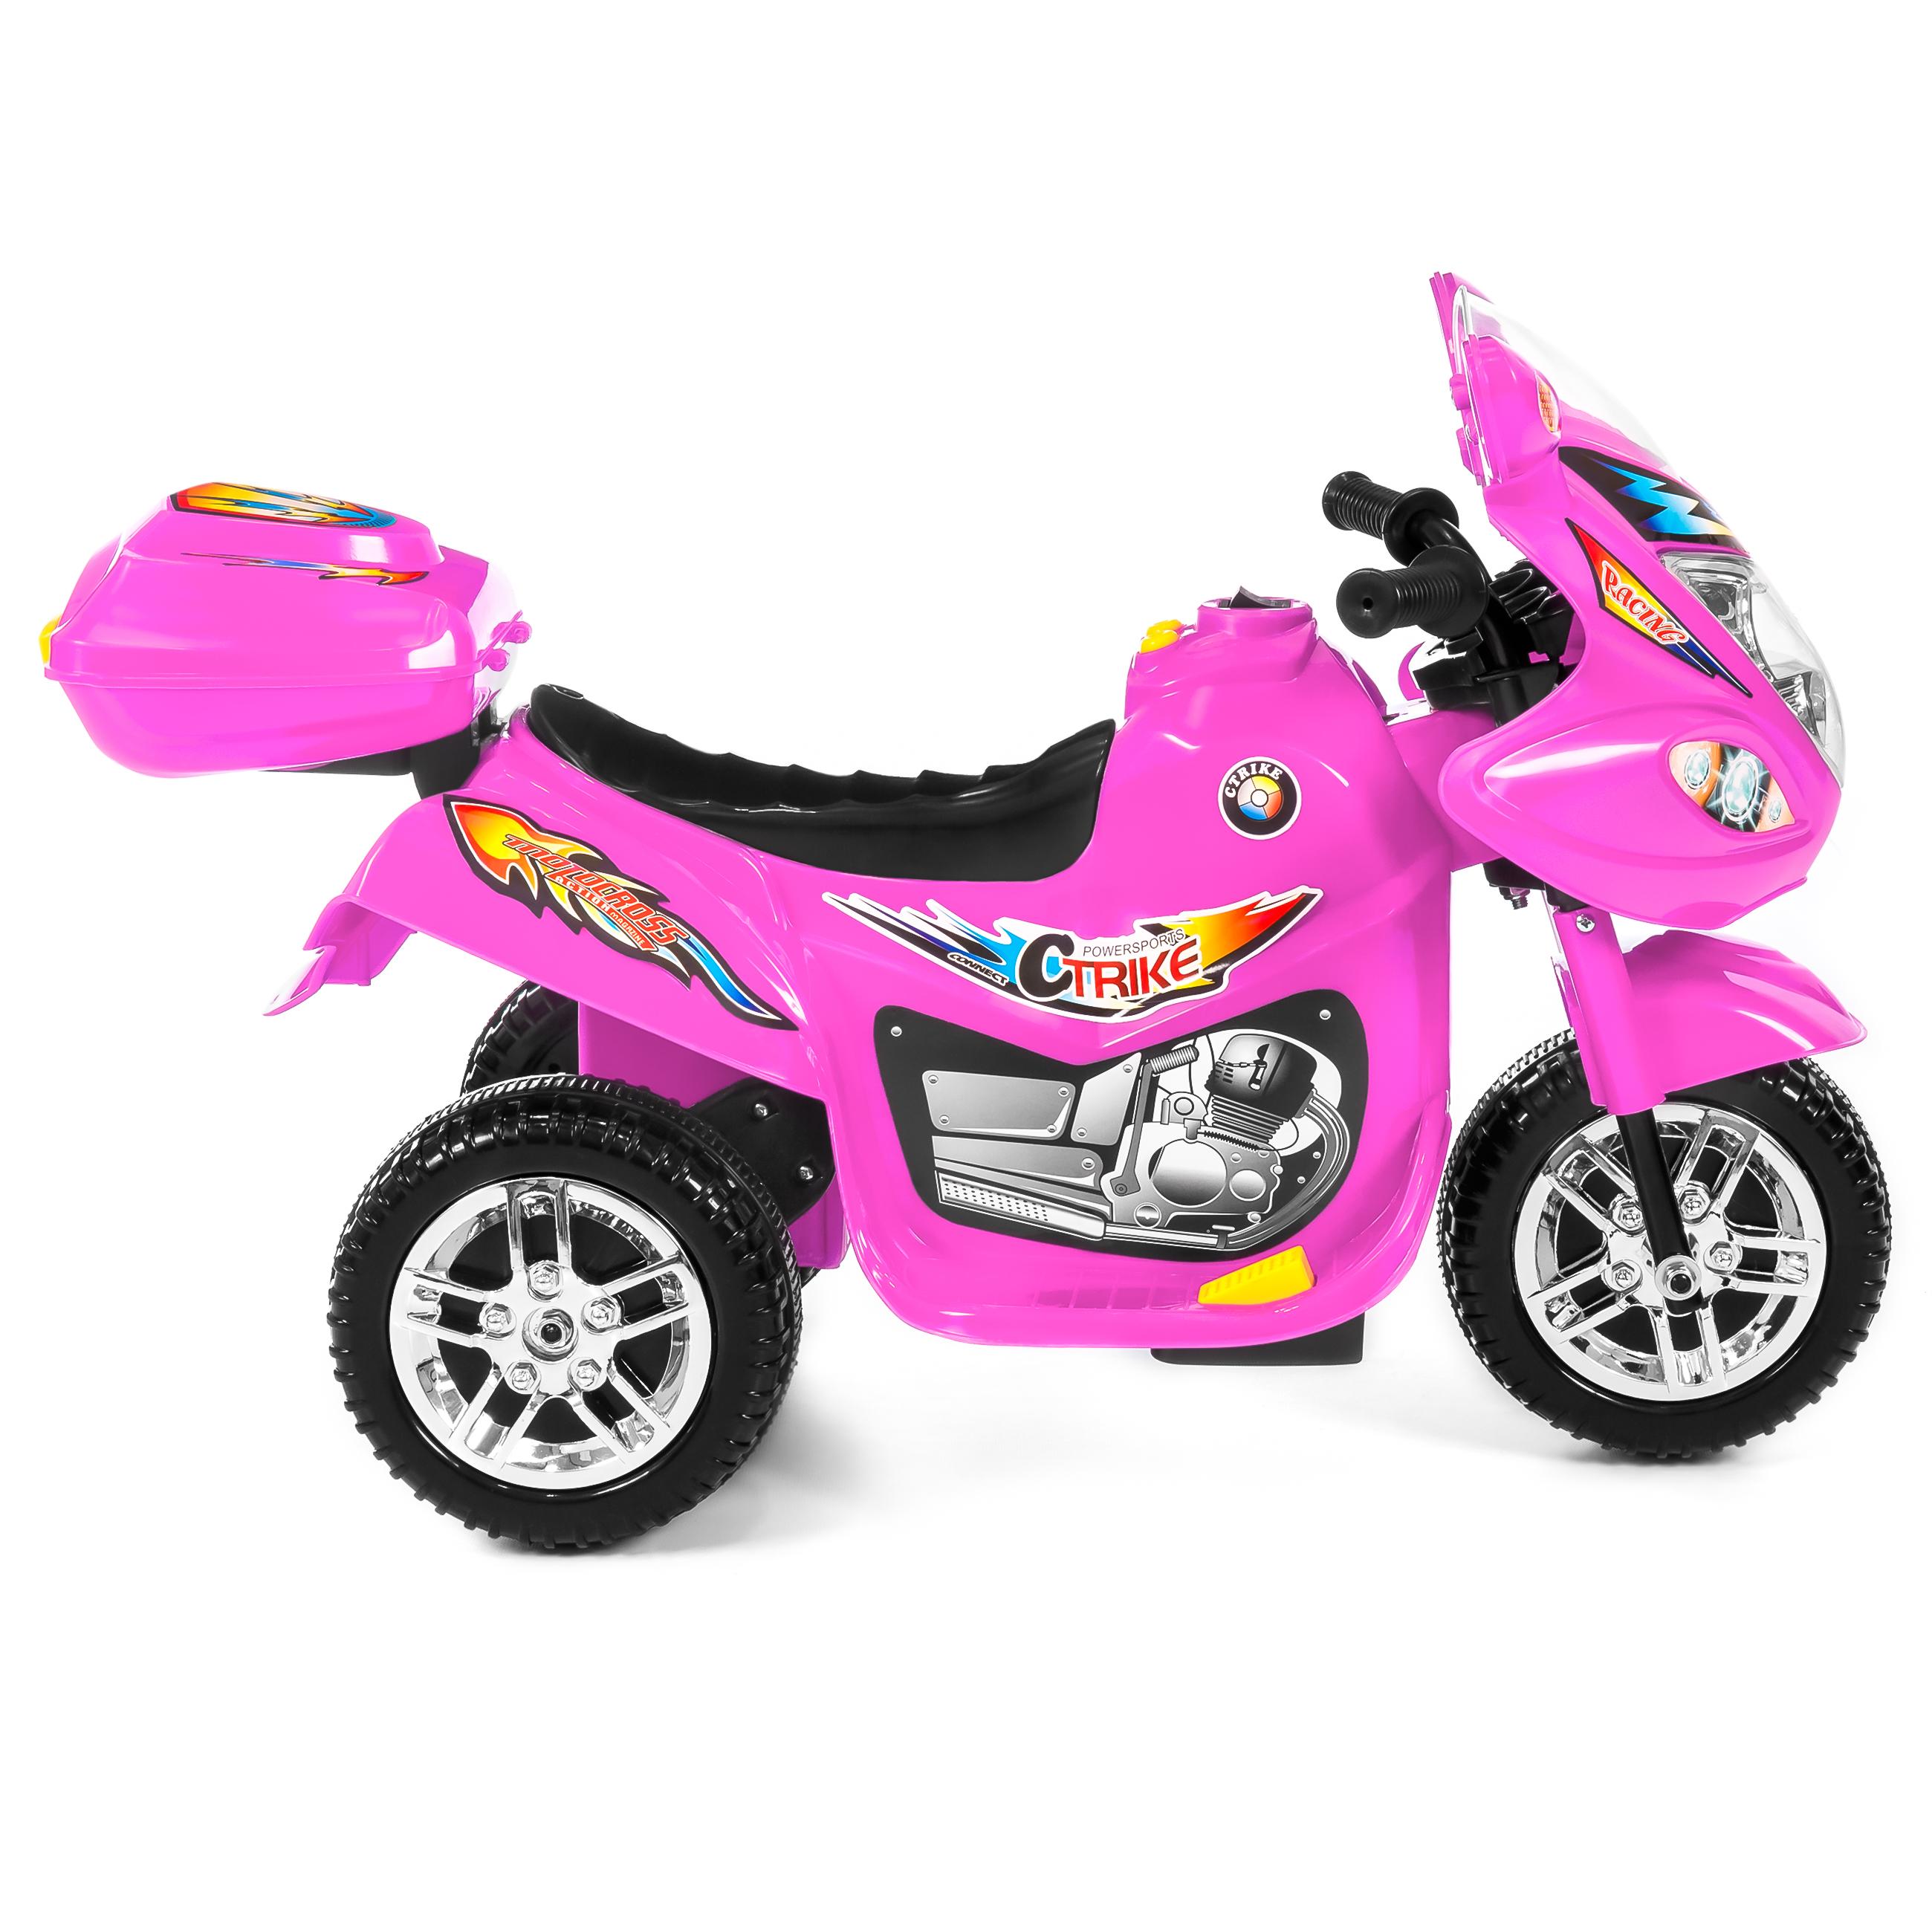 BCP-6V-Kids-3-Wheel-Motorcycle-Ride-On-Toy-w-LED-Lights-Music-Storage thumbnail 26